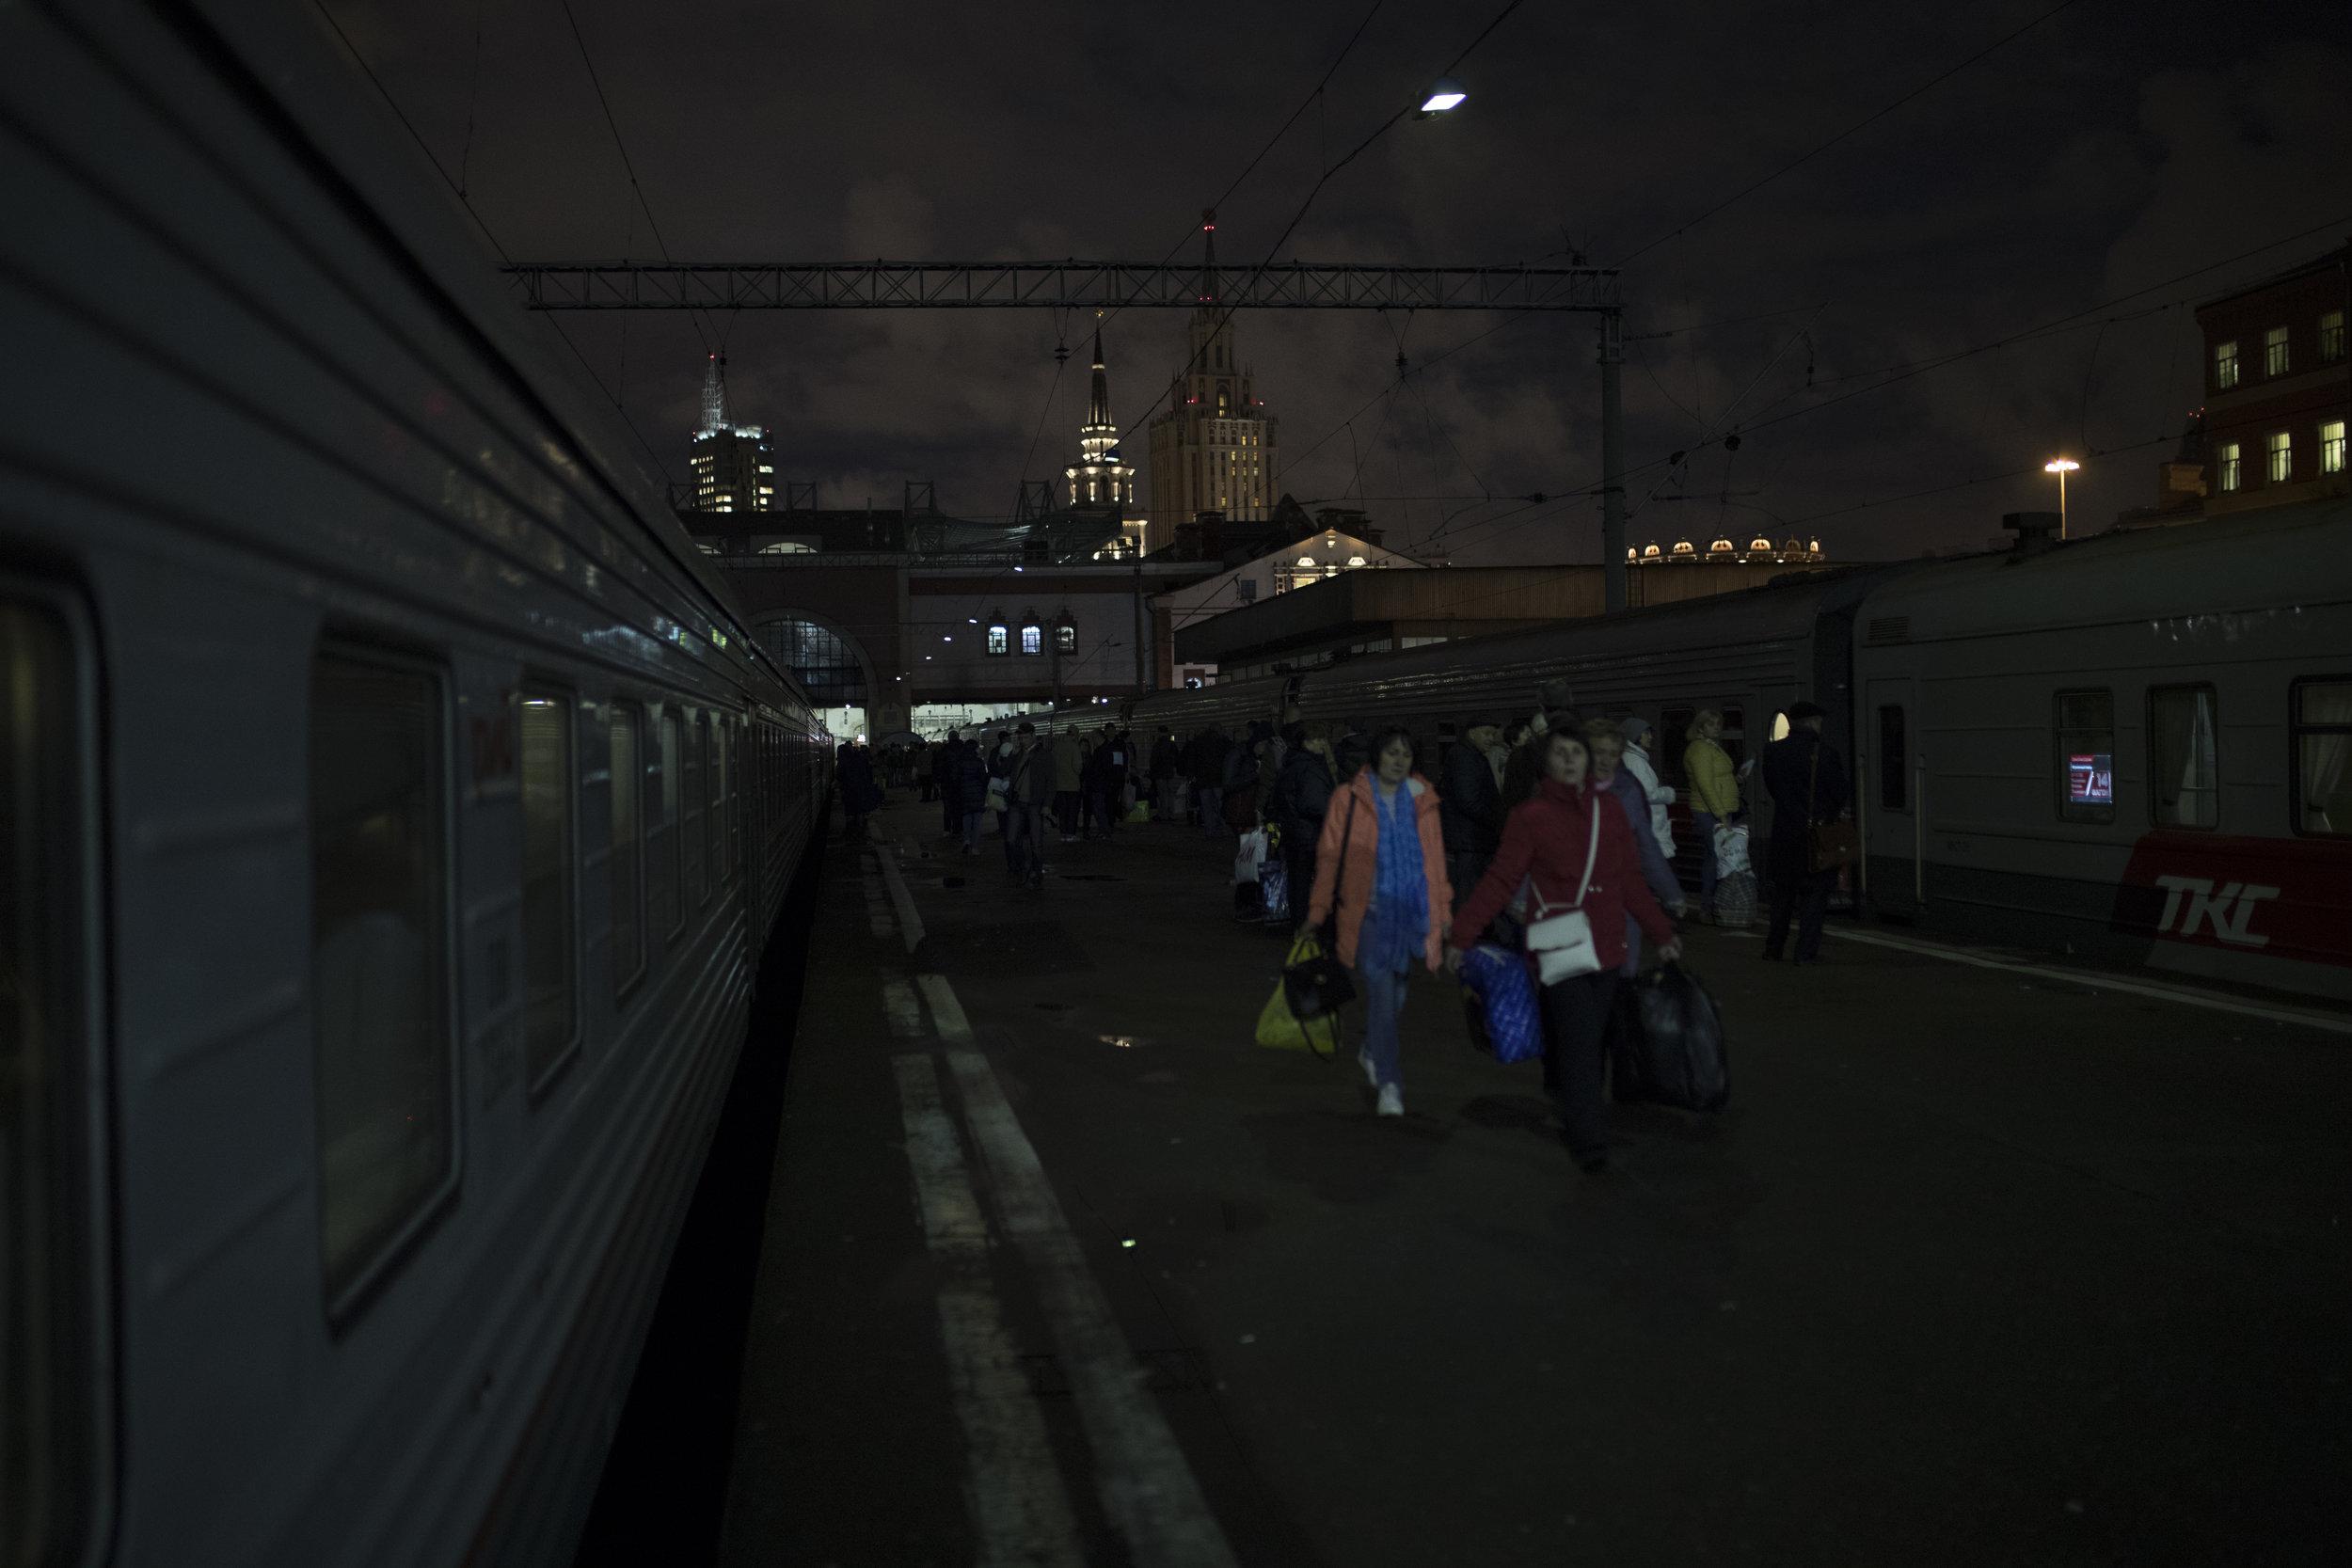 Moskau_Moscow_Soviet_Russia (9).JPG